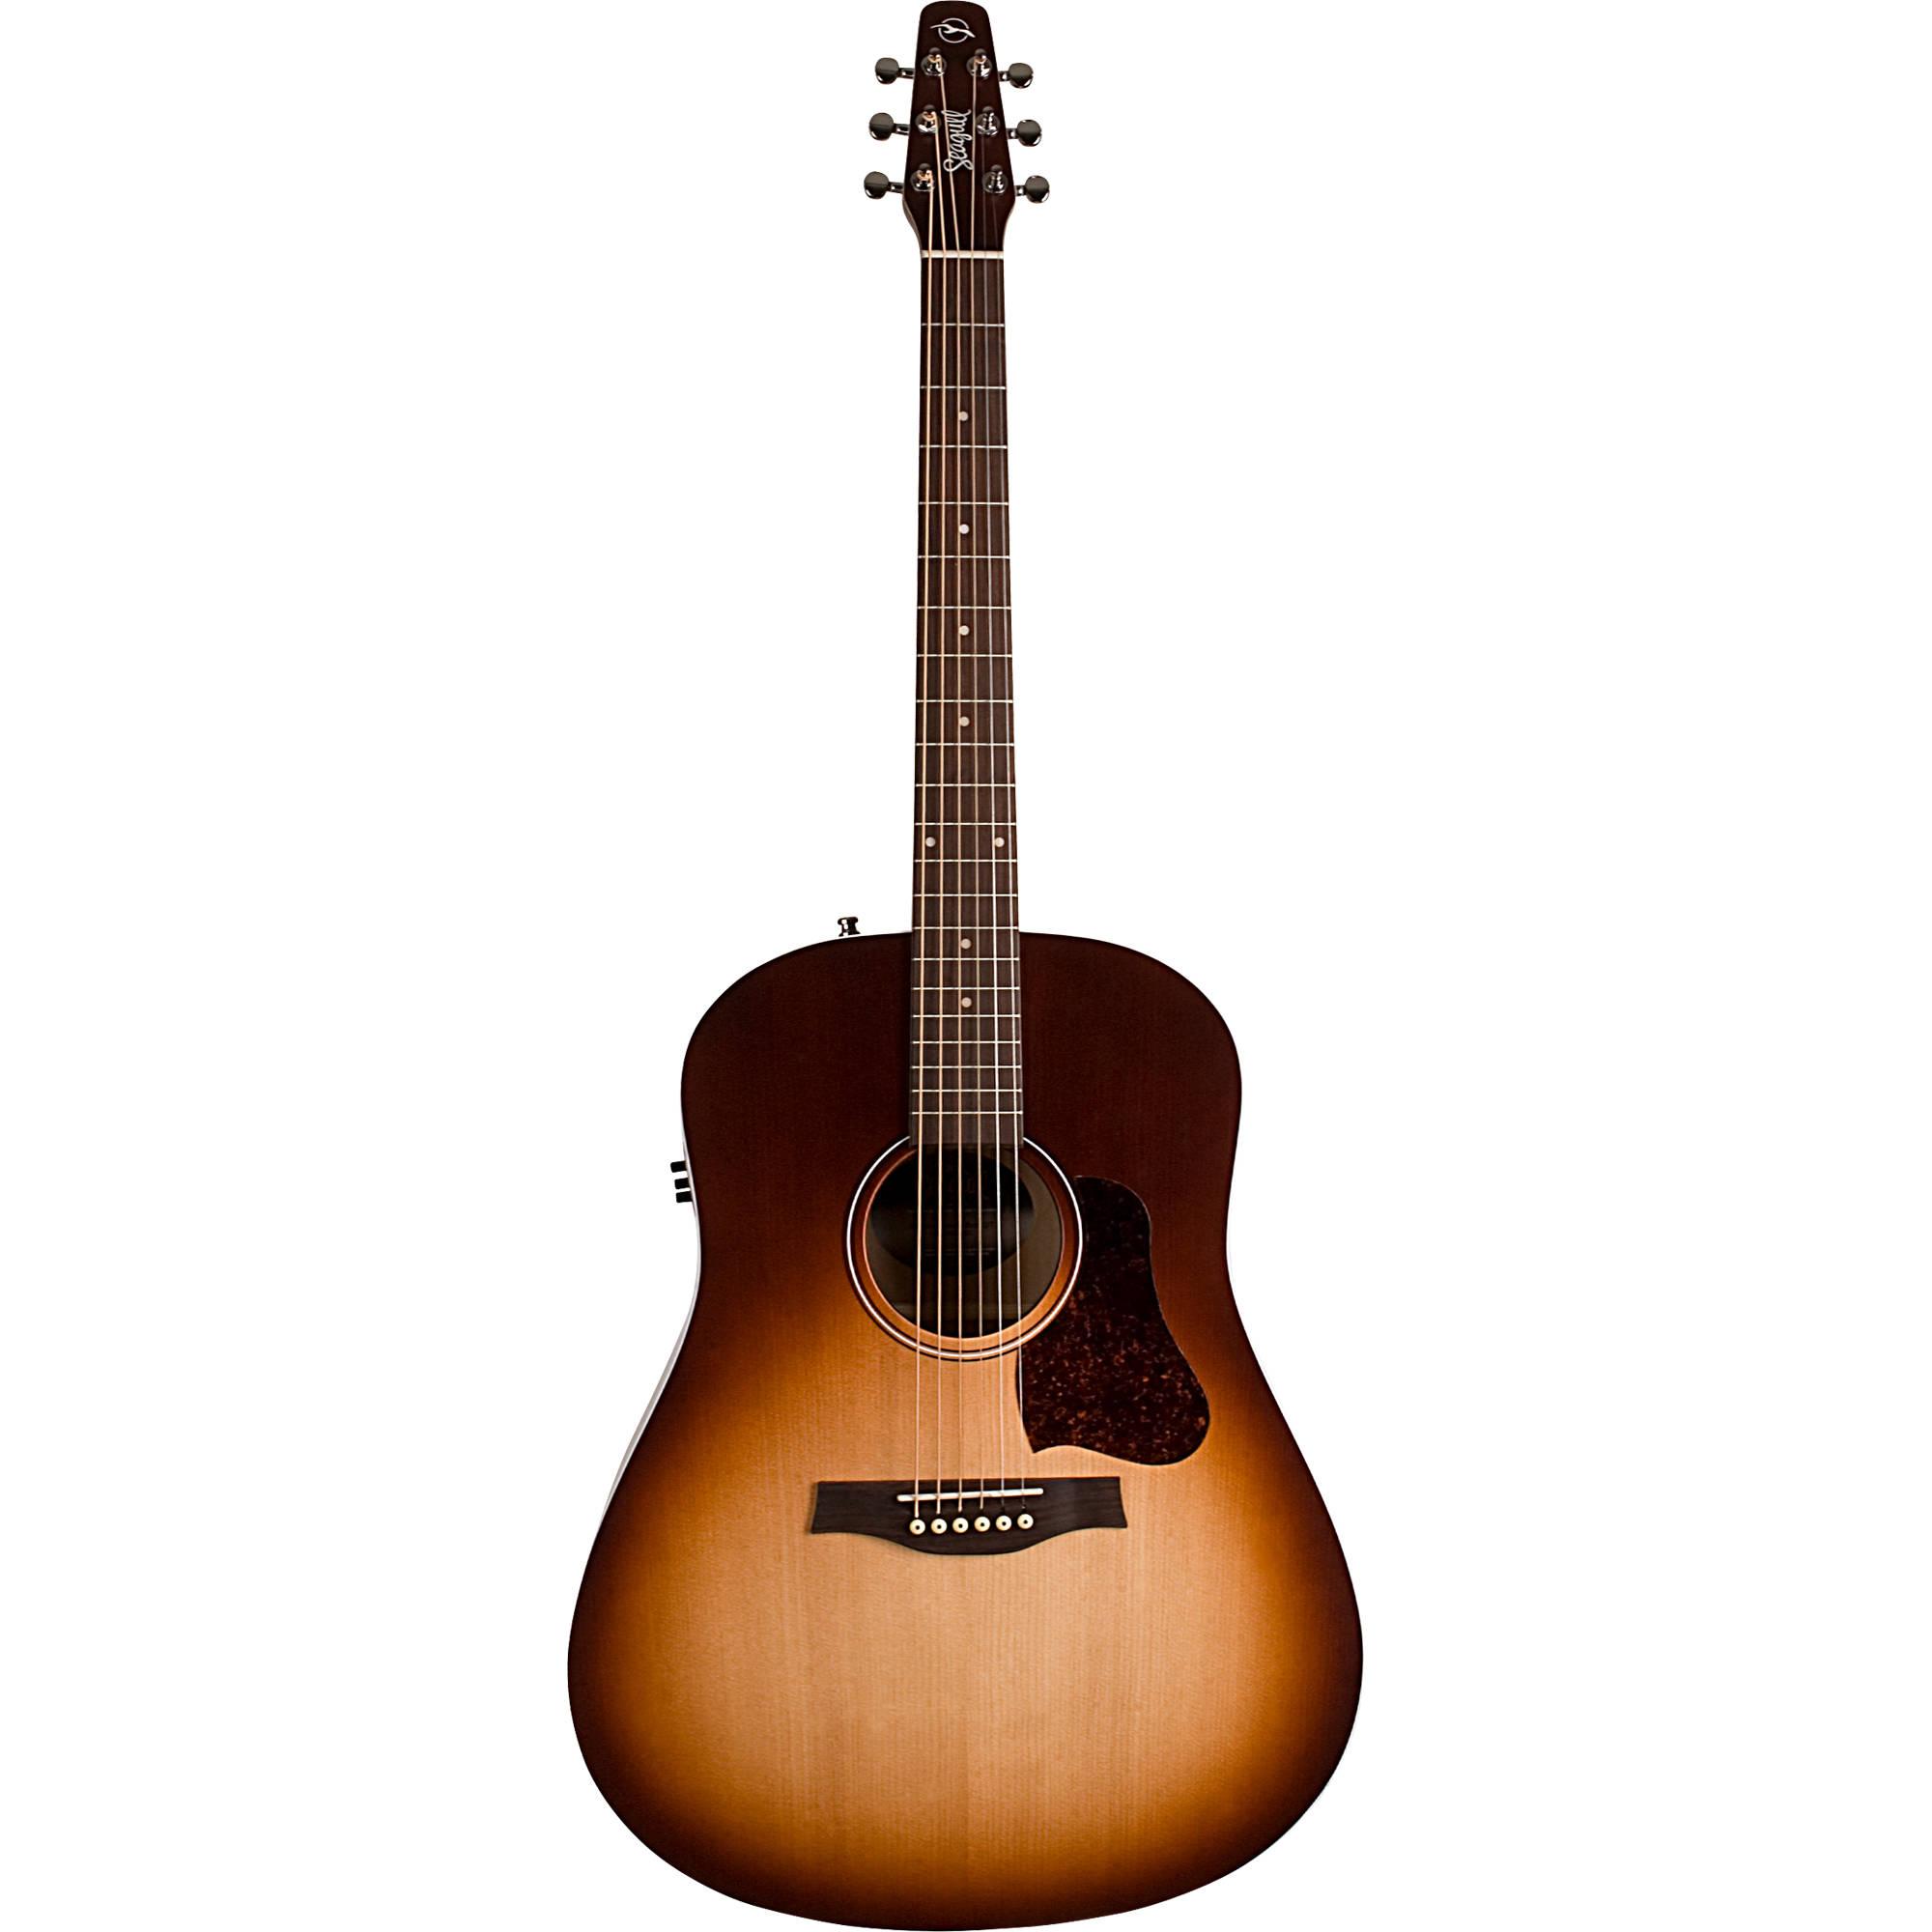 Seagull Guitars Entourage Rustic Acoustic Electric Guitar Autumn Burst